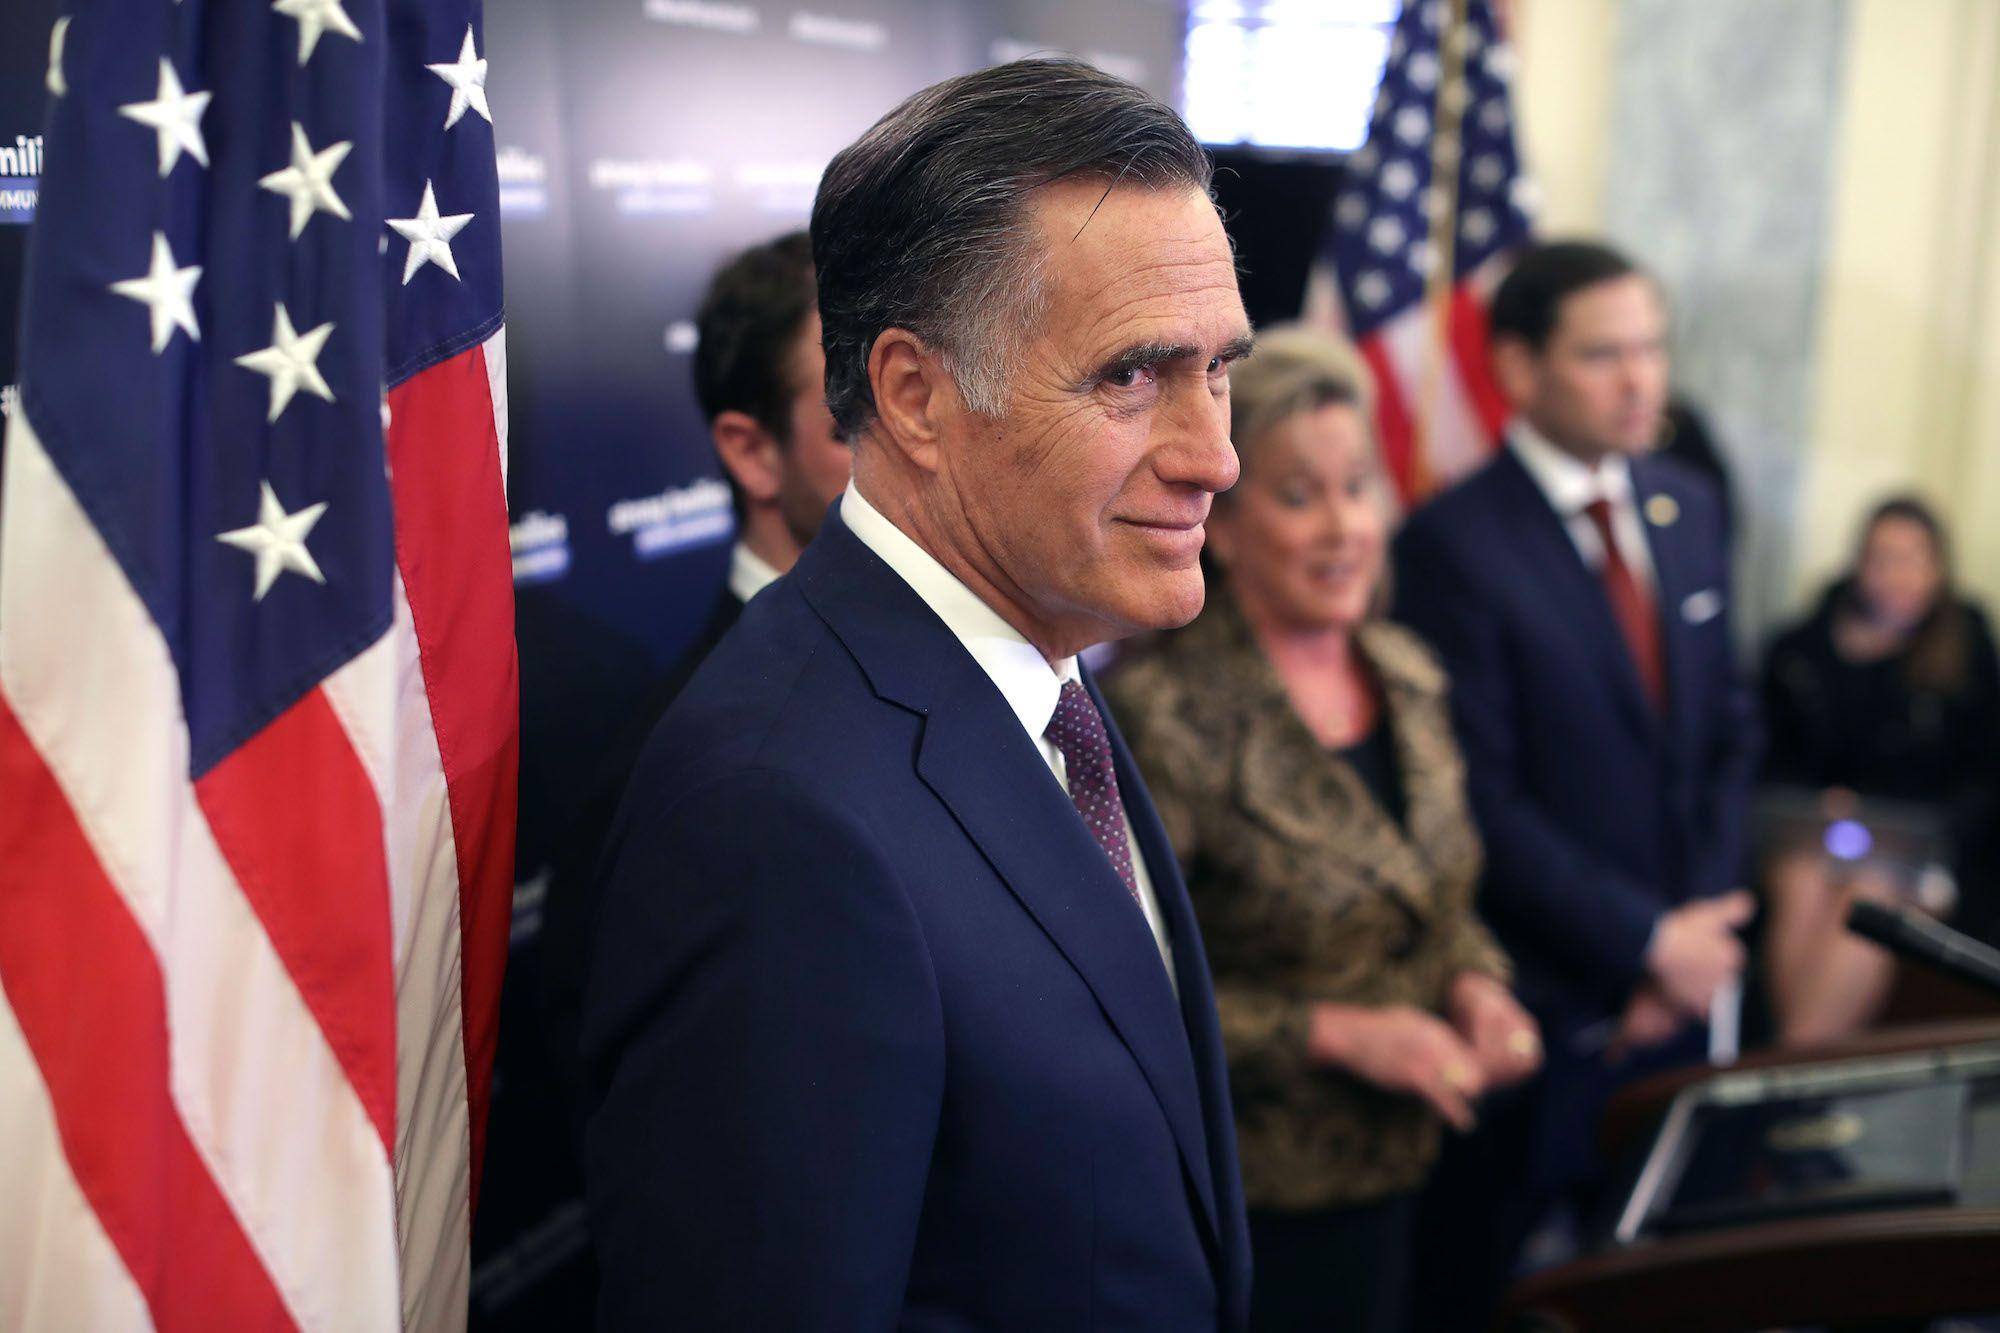 Romney puts on a brave face.